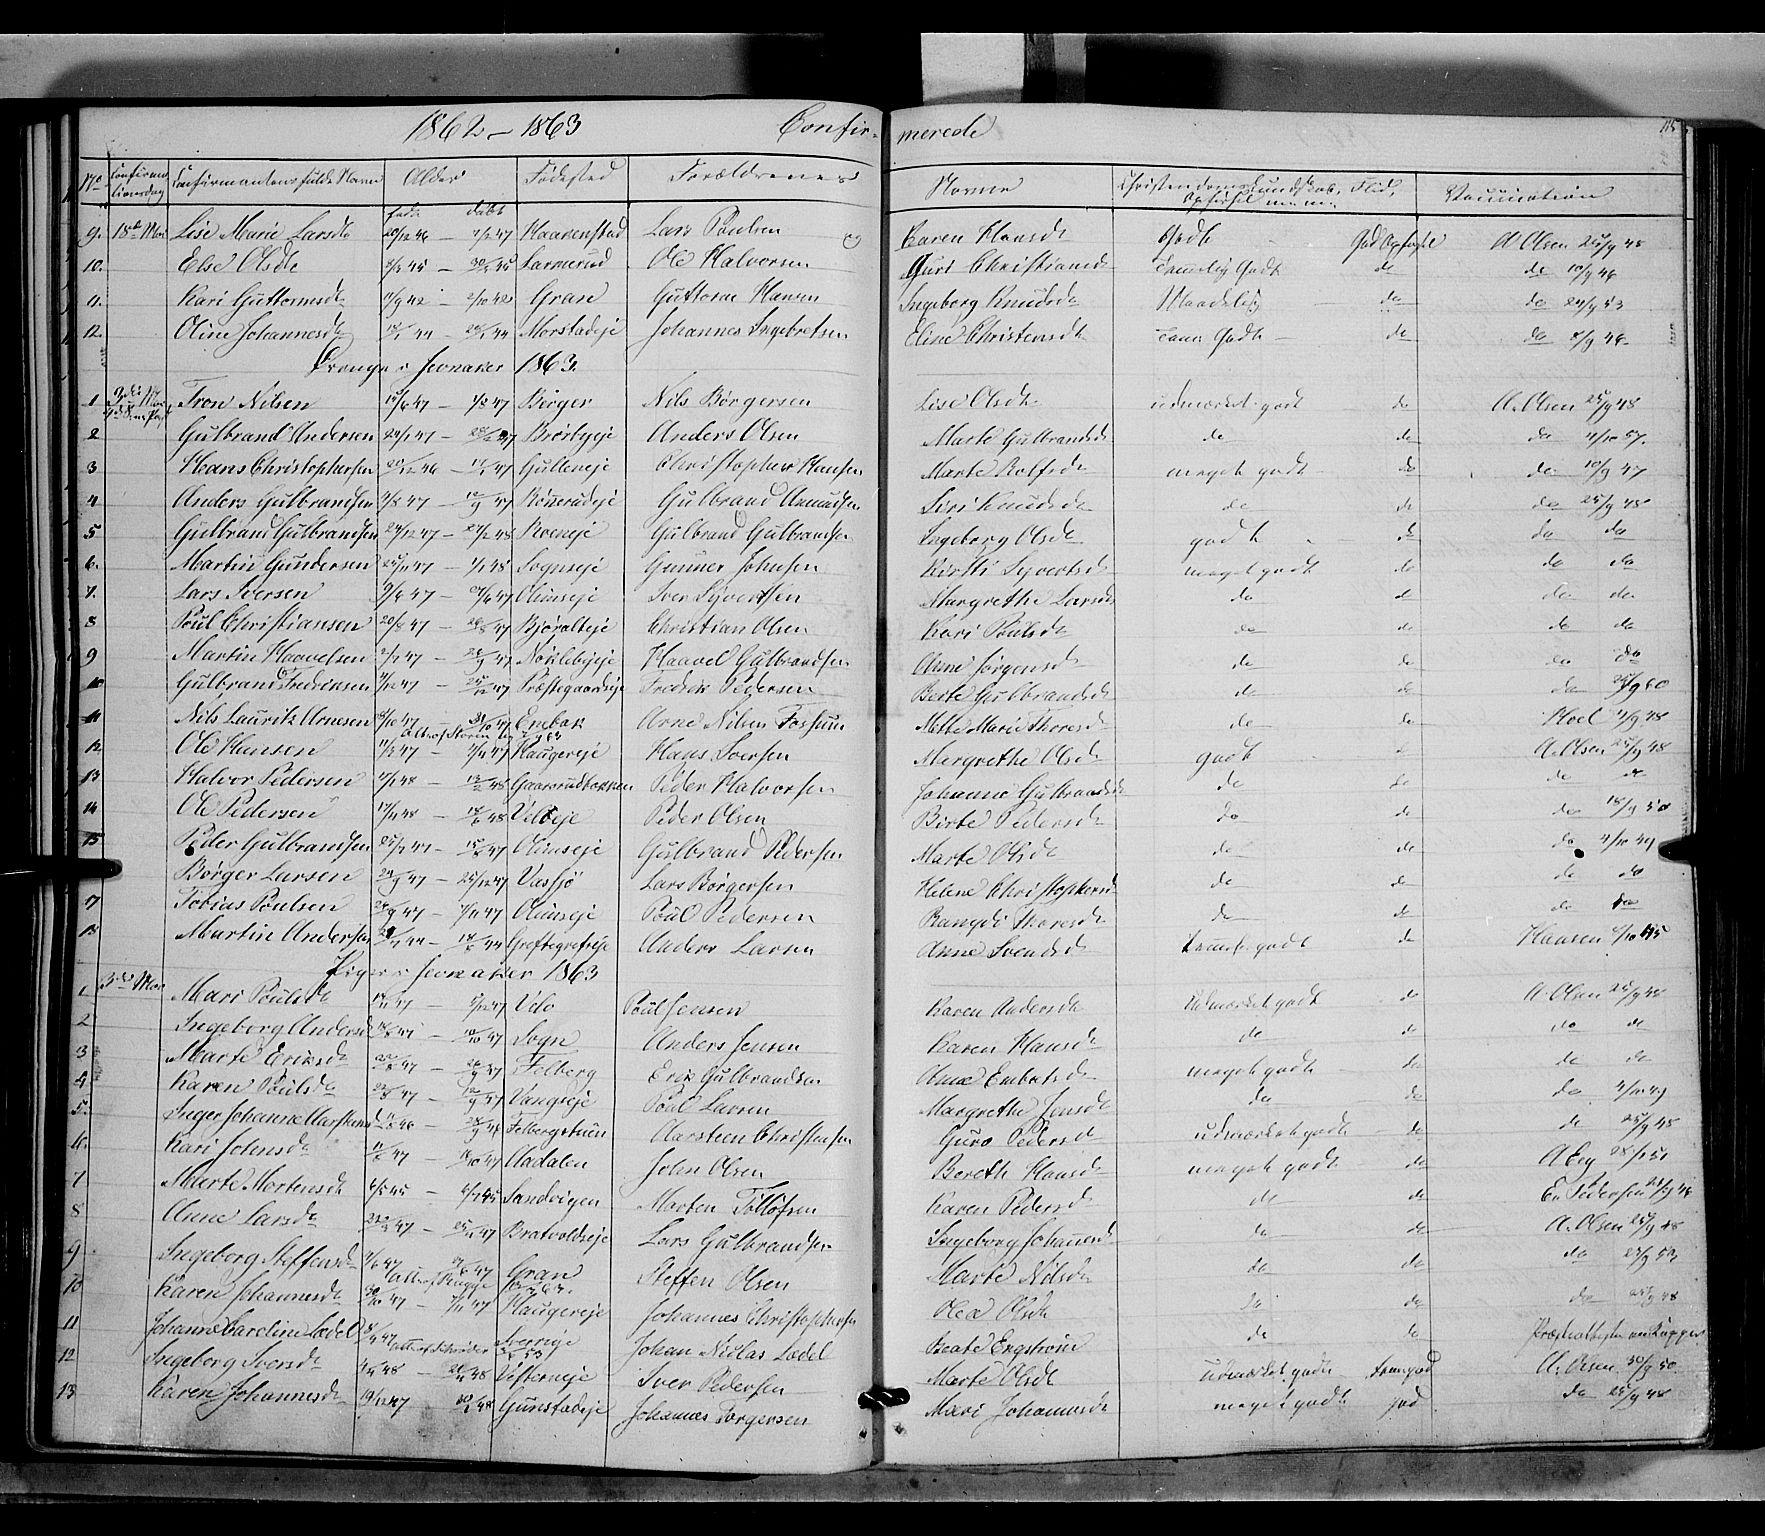 SAH, Jevnaker prestekontor, Ministerialbok nr. 7, 1858-1876, s. 115